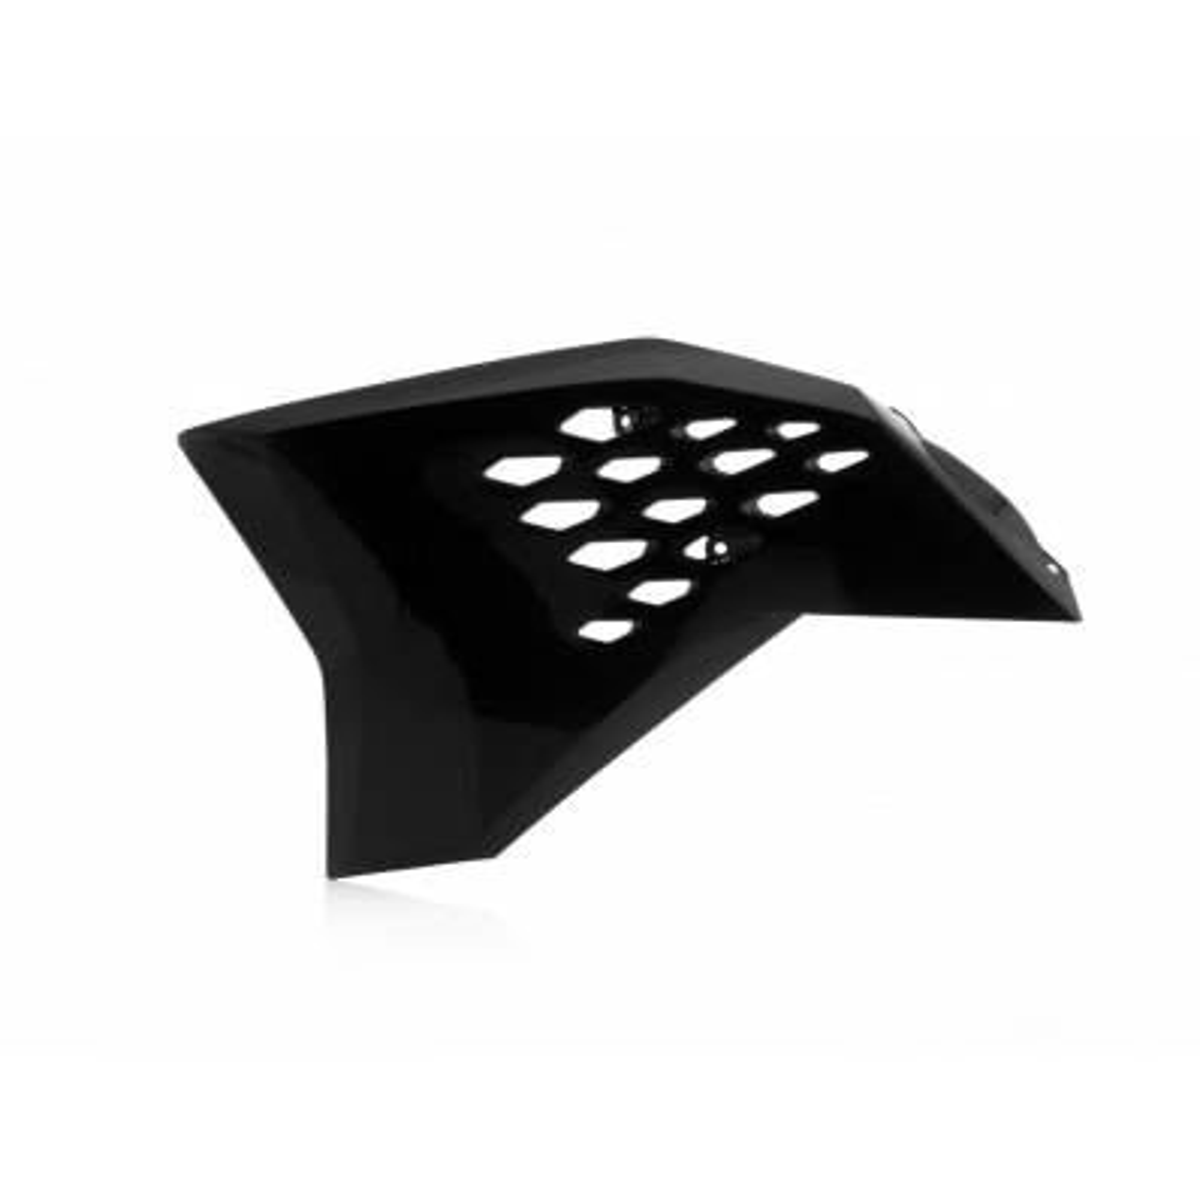 0010297-090 - Tapa Radiador Ktm 08 11 Negro